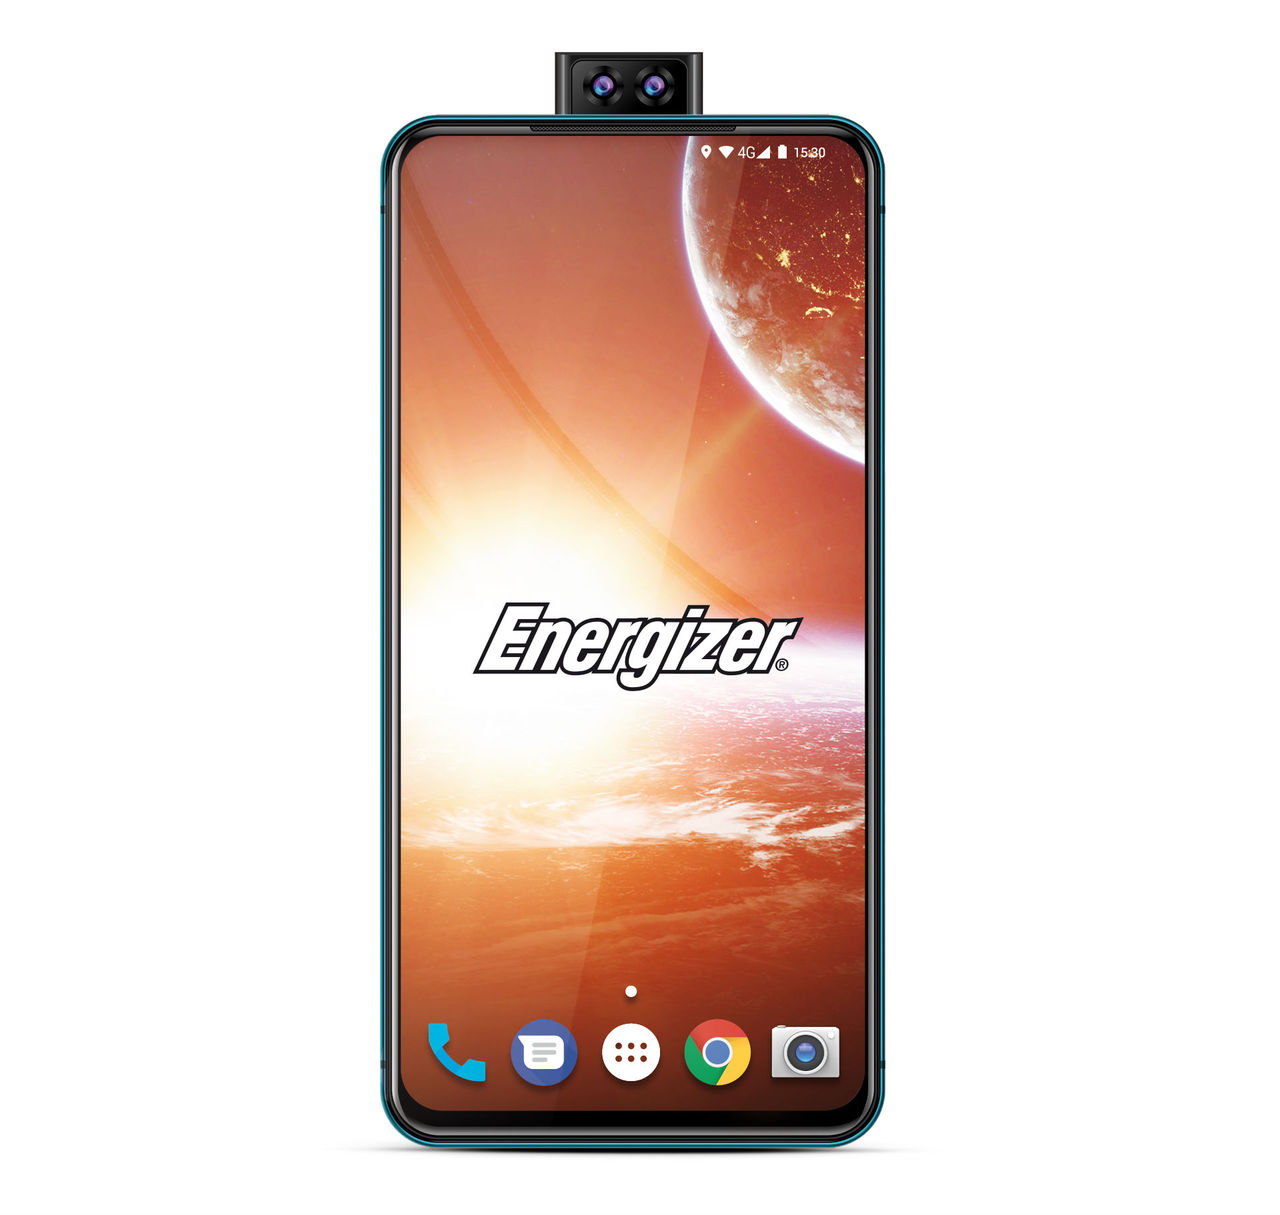 Energizer visar upp telefon med bisarrt stort batteri